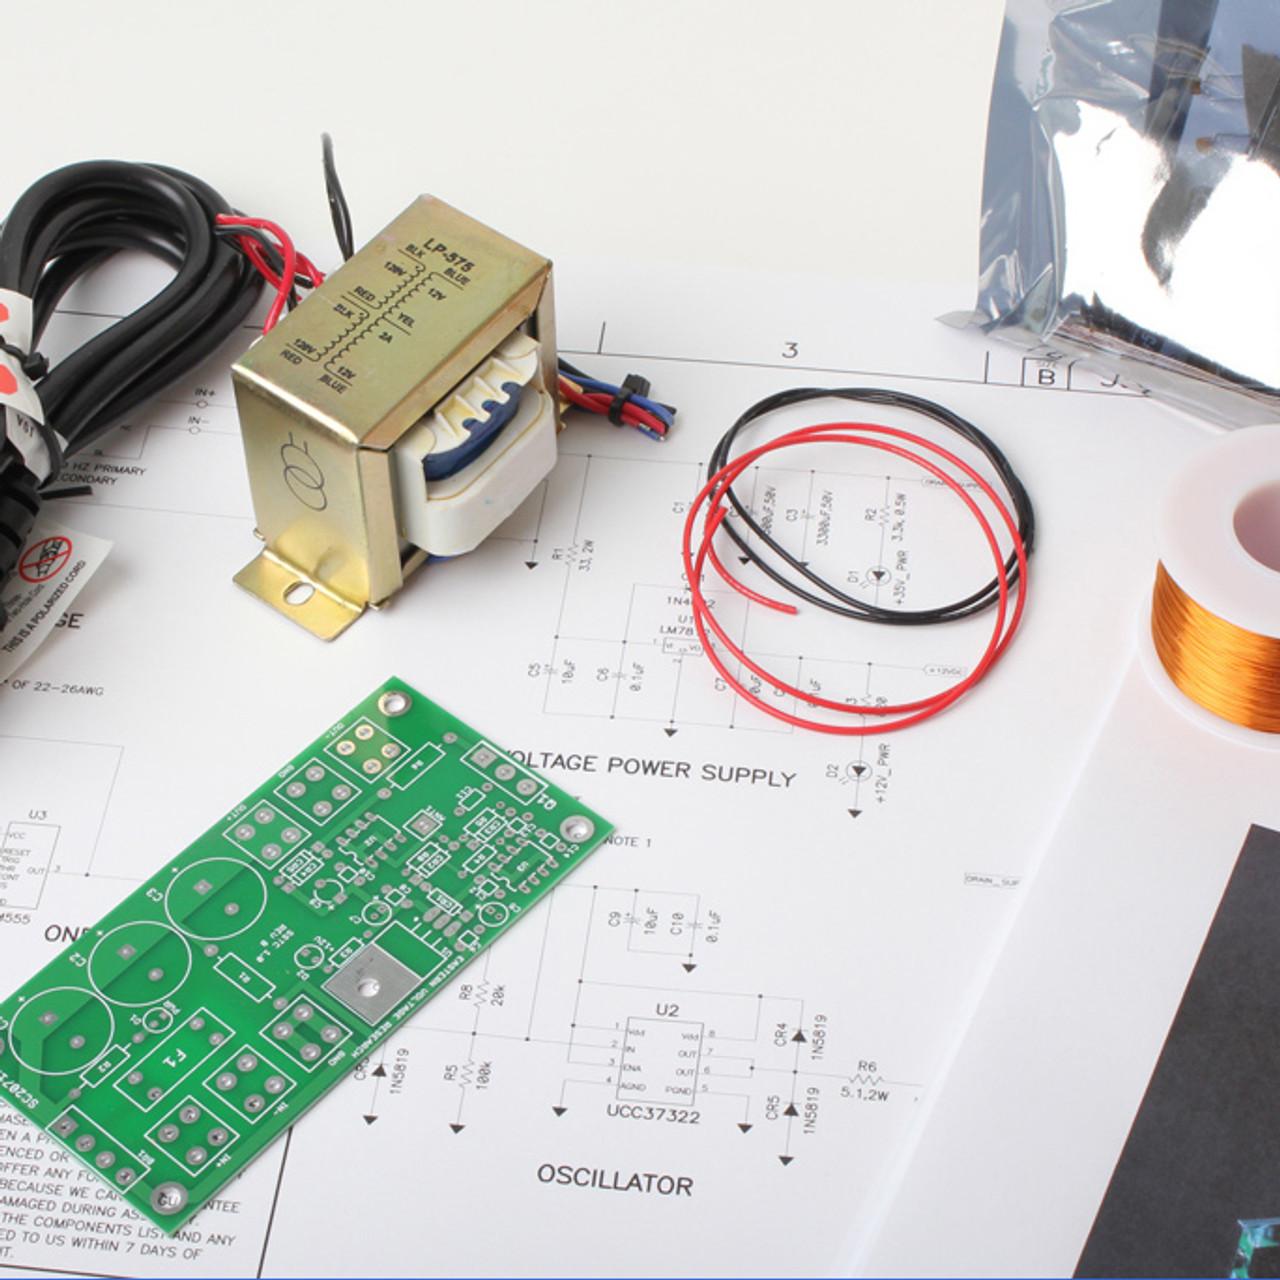 SSTC 1.0 Tesla Coil Kit